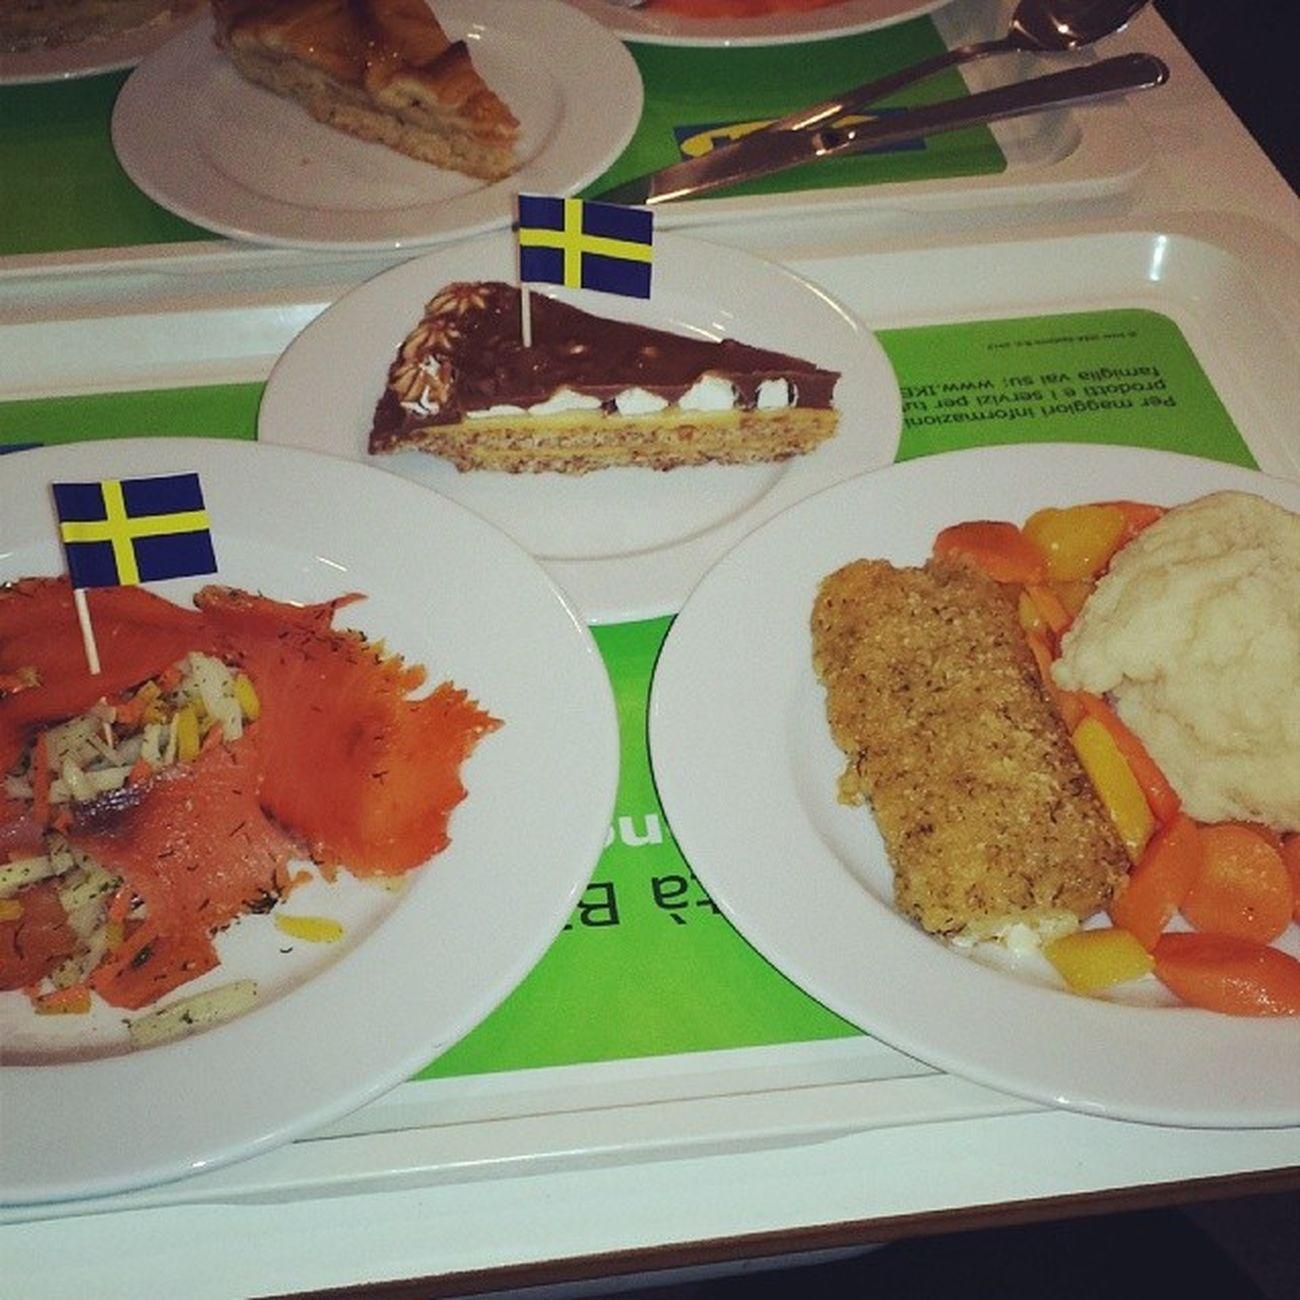 Bon Apetit Pranzo IKEA instamoment instalike instagram instaphoto instafoto instafood